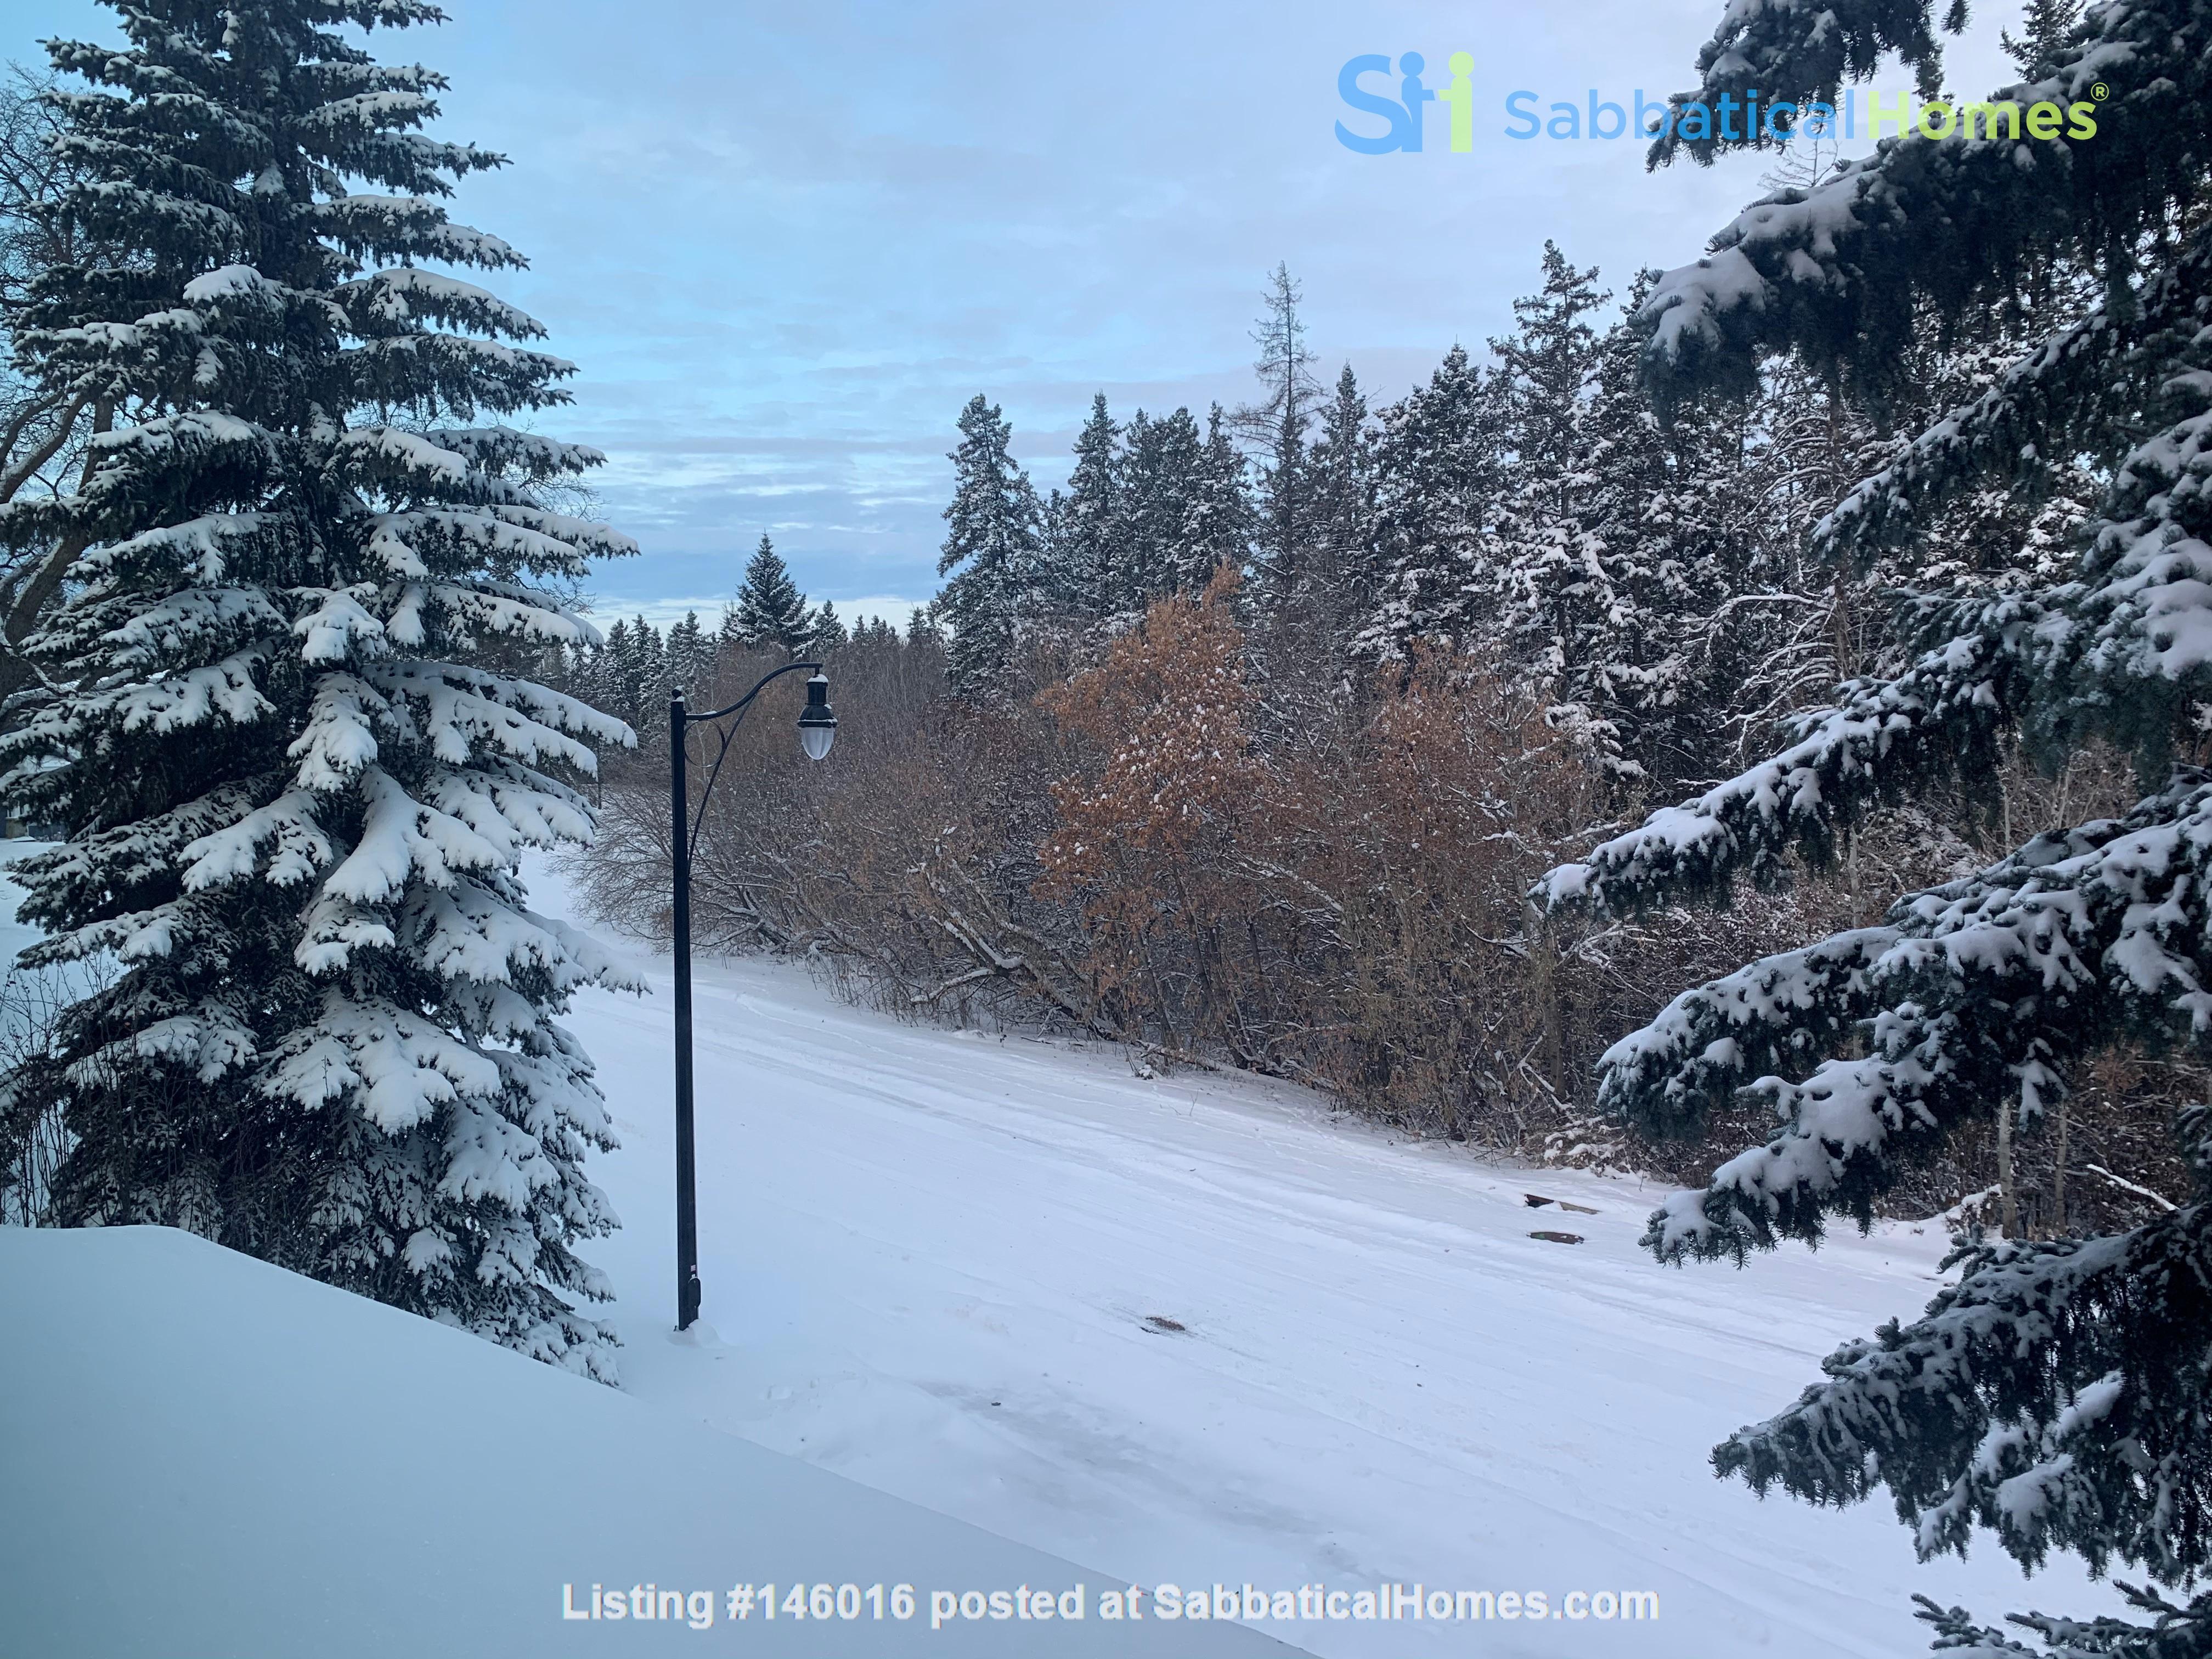 Forest haven sabbatical home Home Rental in Edmonton 4